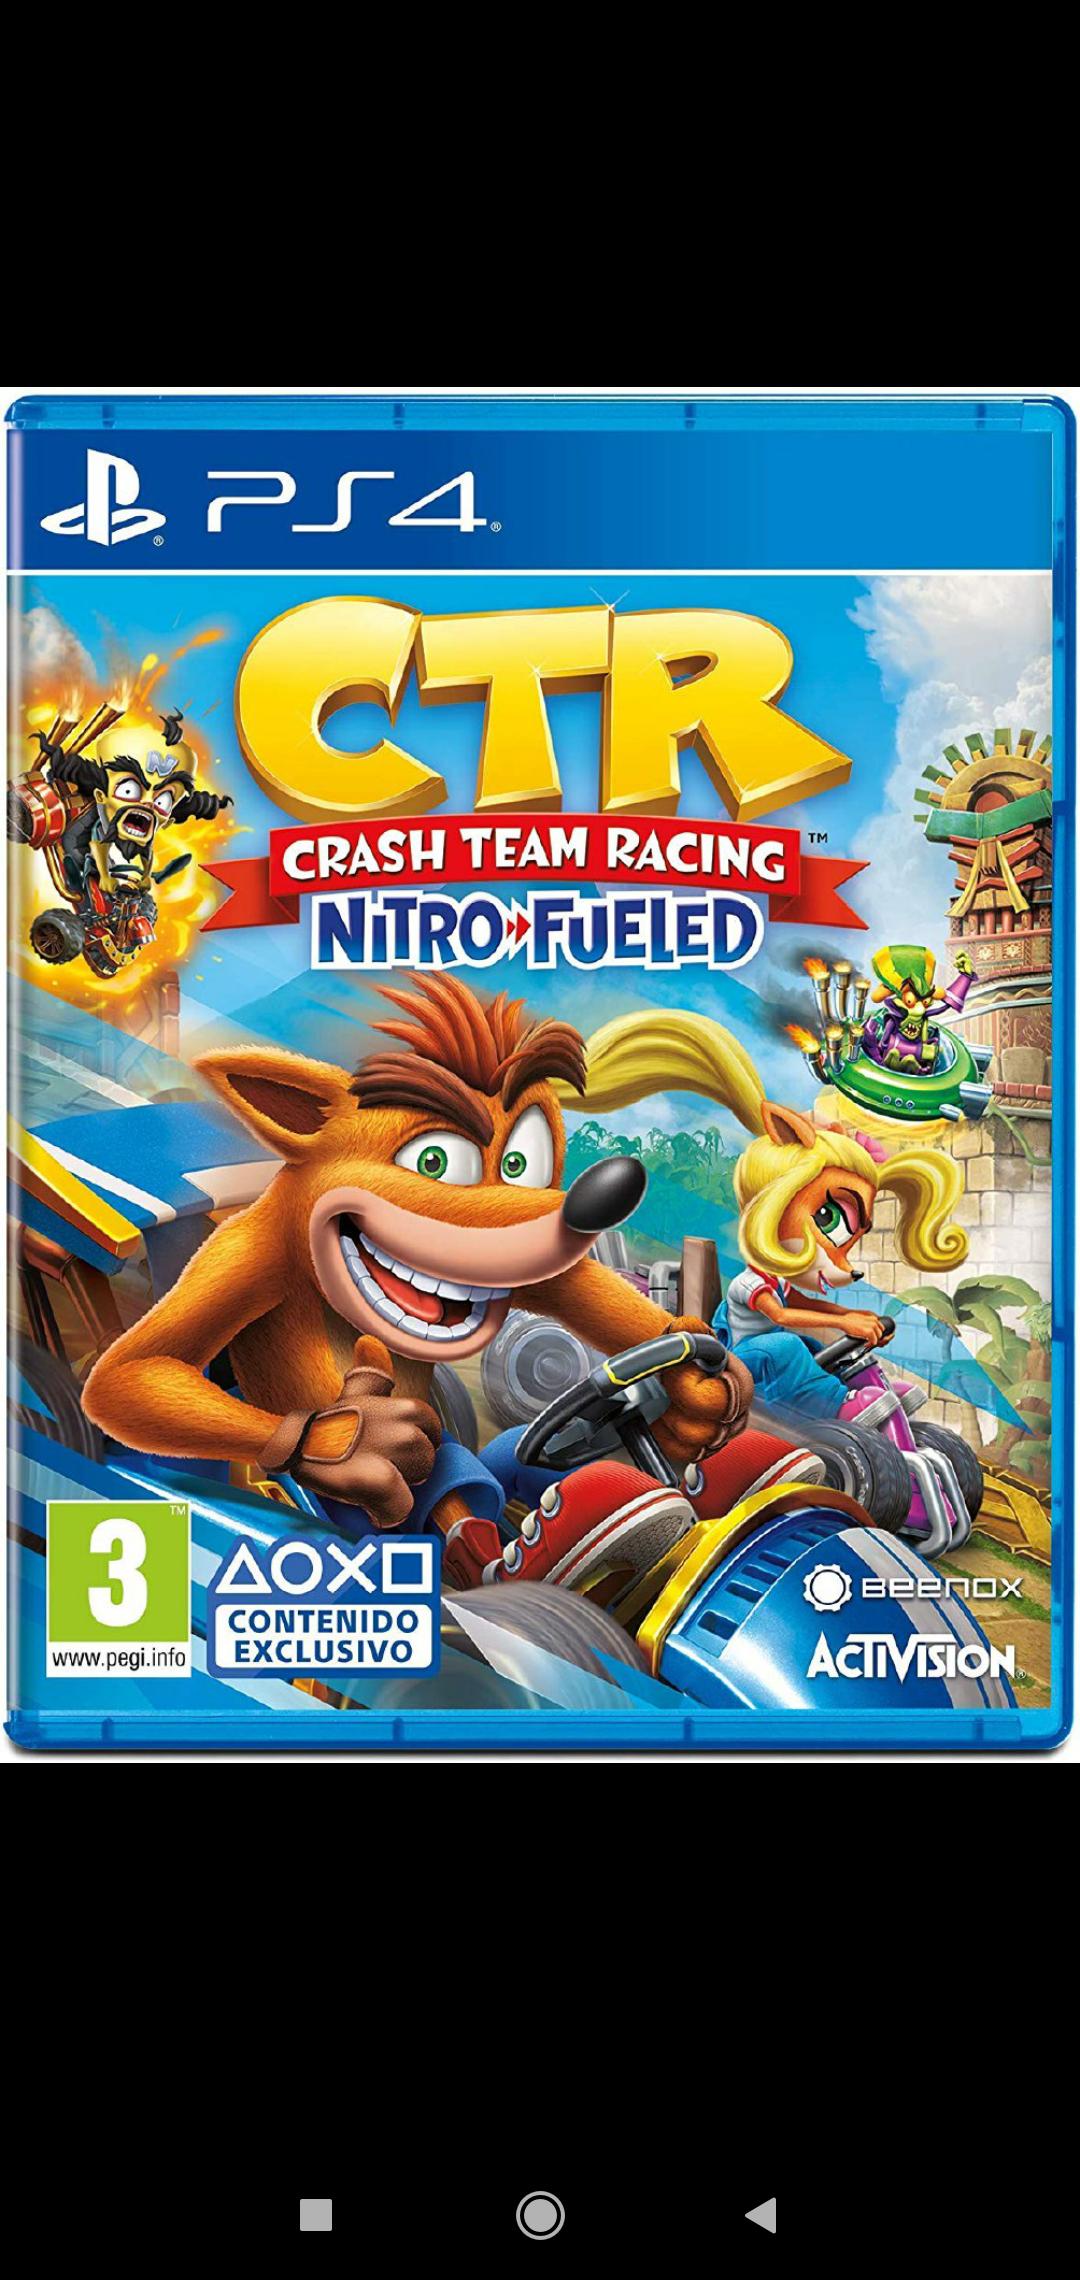 Juego Crash Team Racing Nitro Fueled PS4